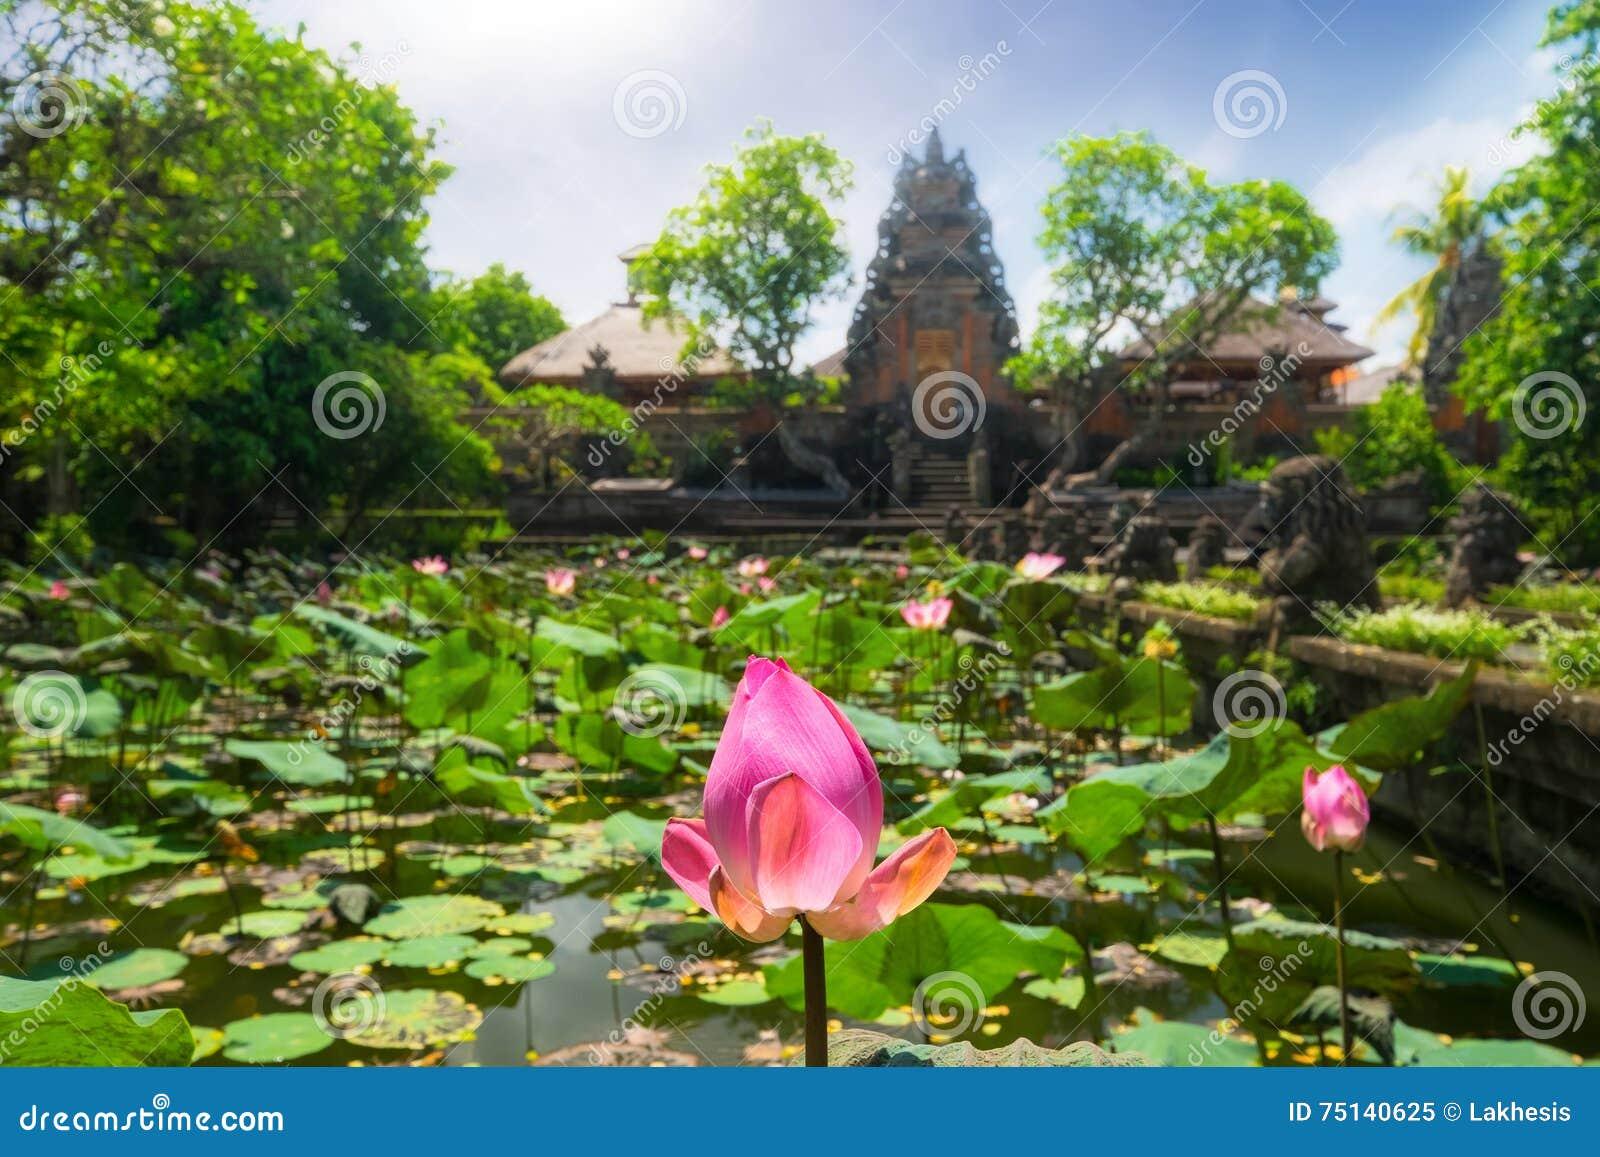 Pura Saraswati Hindu Temple In Ubud Bali Indonesia Stock Image